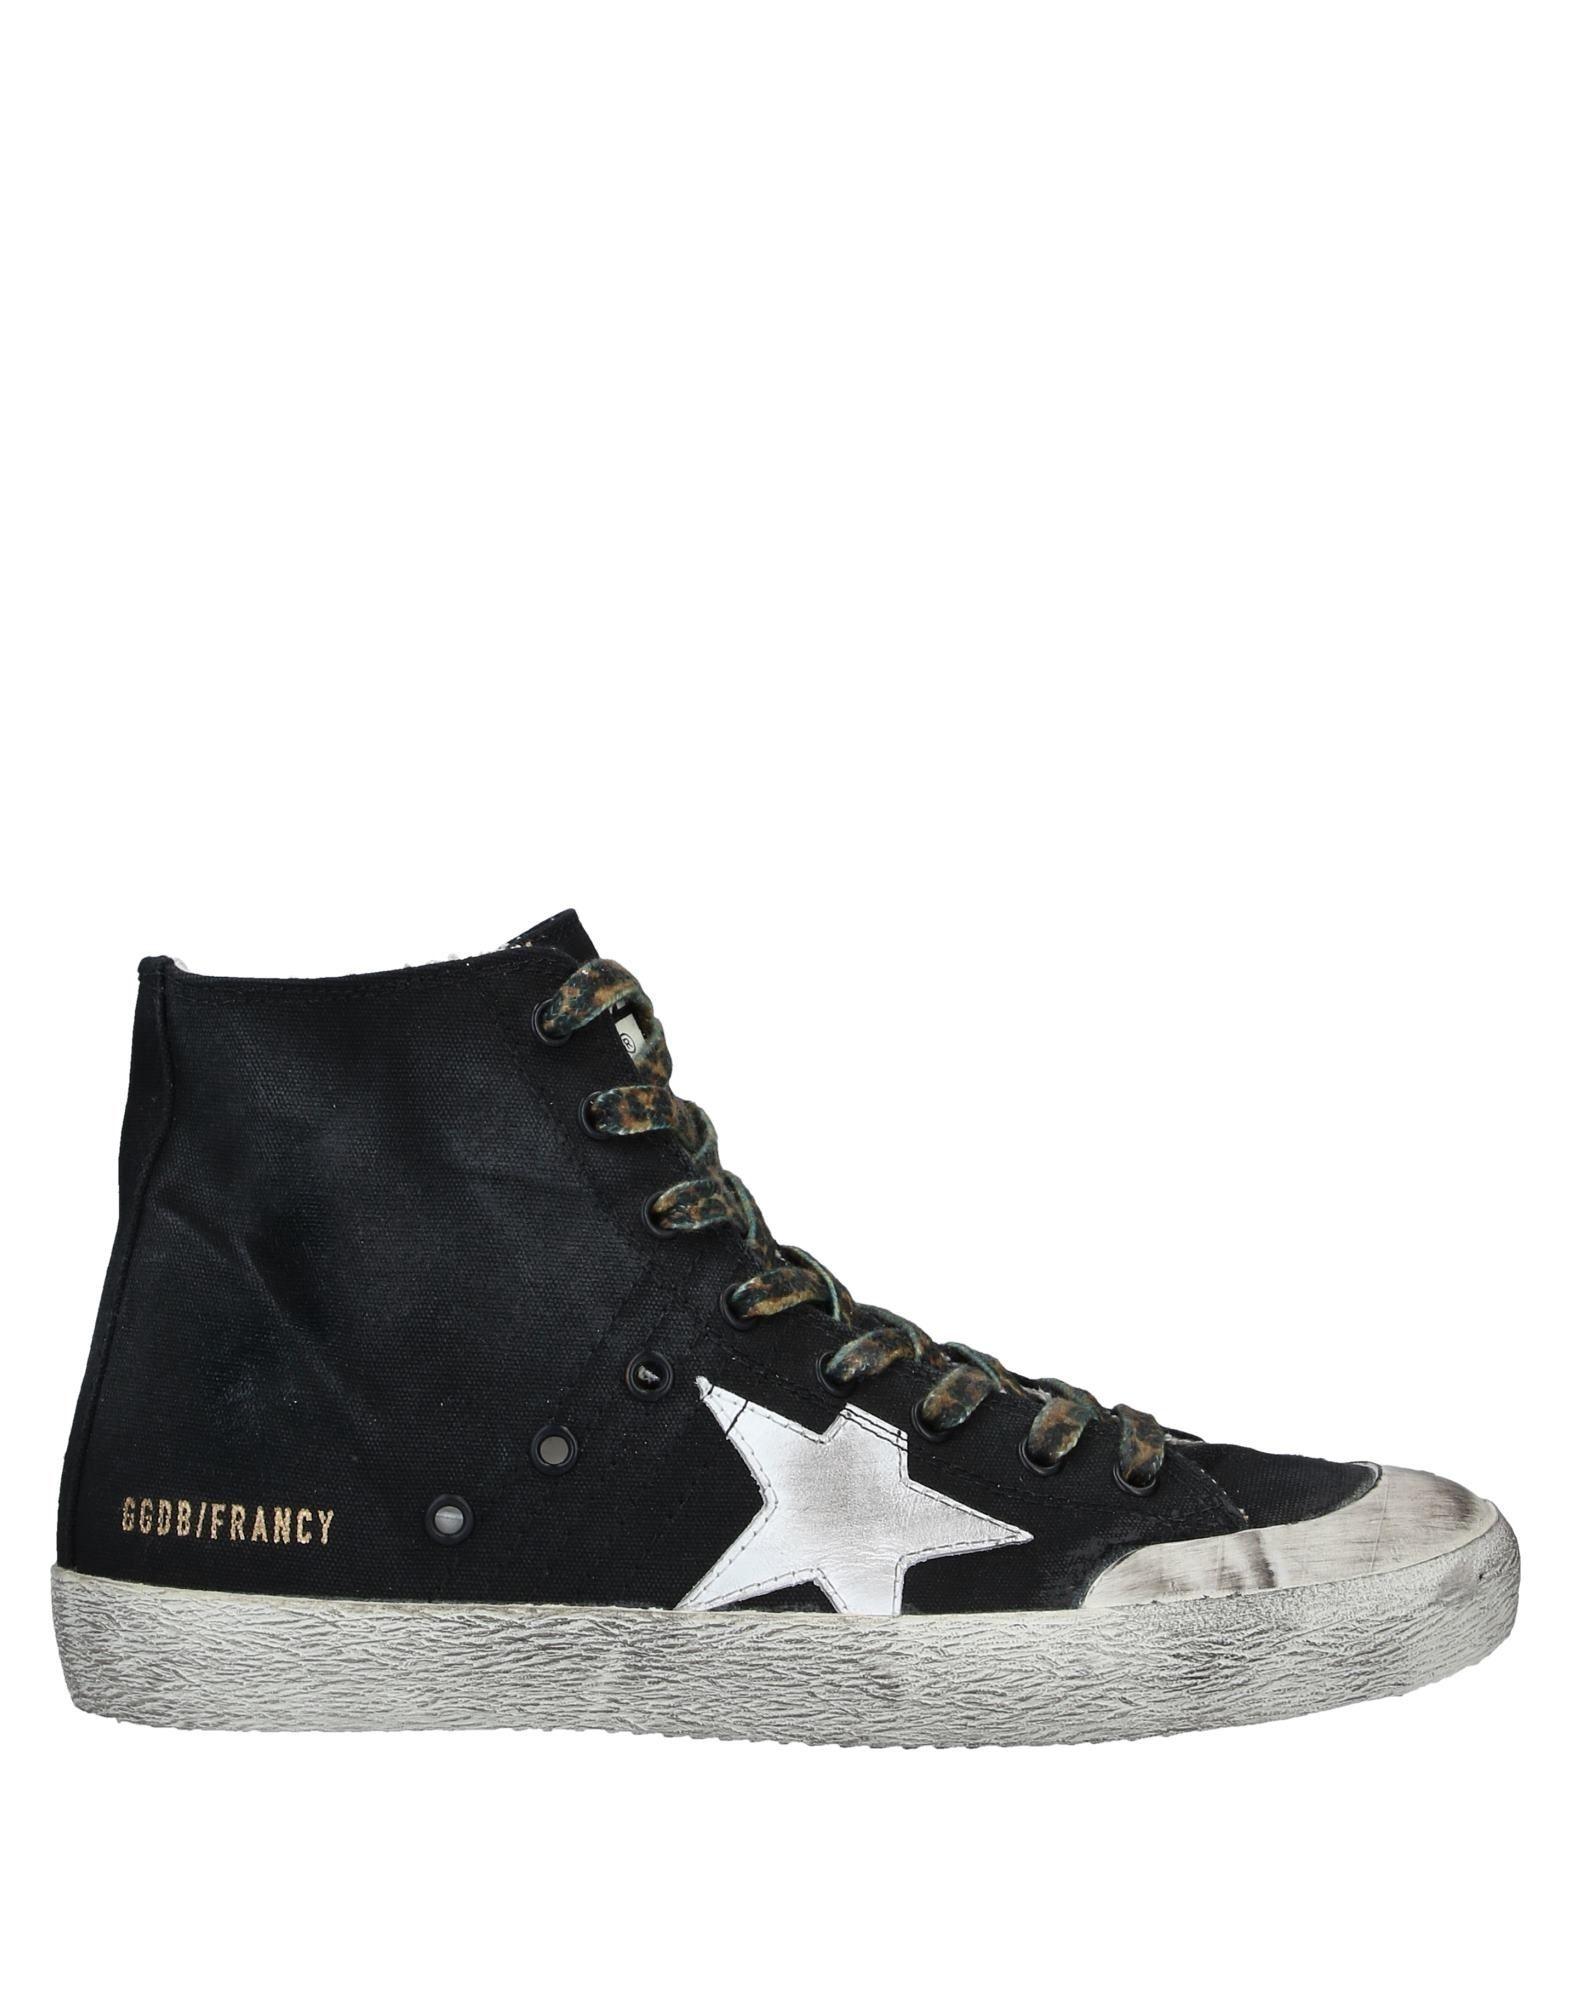 Golden Goose Deluxe Brand Sneakers Women Golden Goose Deluxe Brand Sneakers Online On Yoox United States 1173079 Sneaker Lederschuhe Damen Turnschuhe Damen